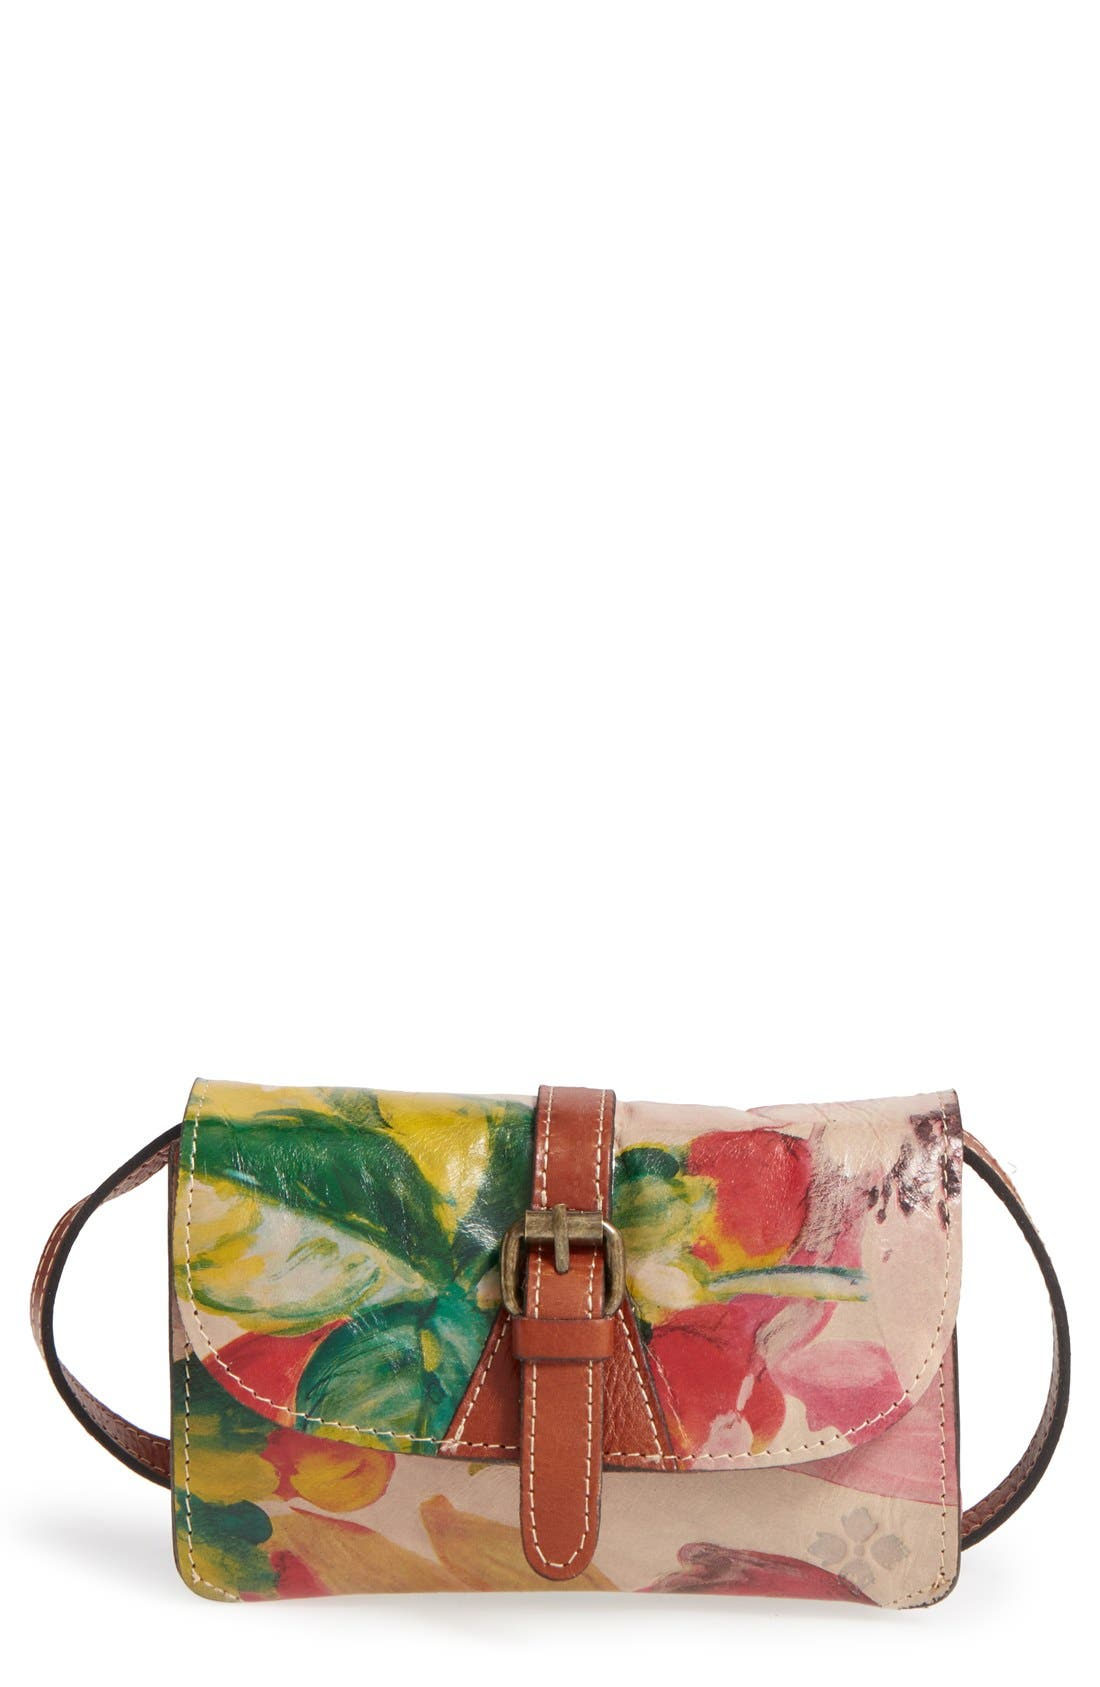 Main Image - Patricia Nash 'Torri' Italian Leather Crossbody Bag